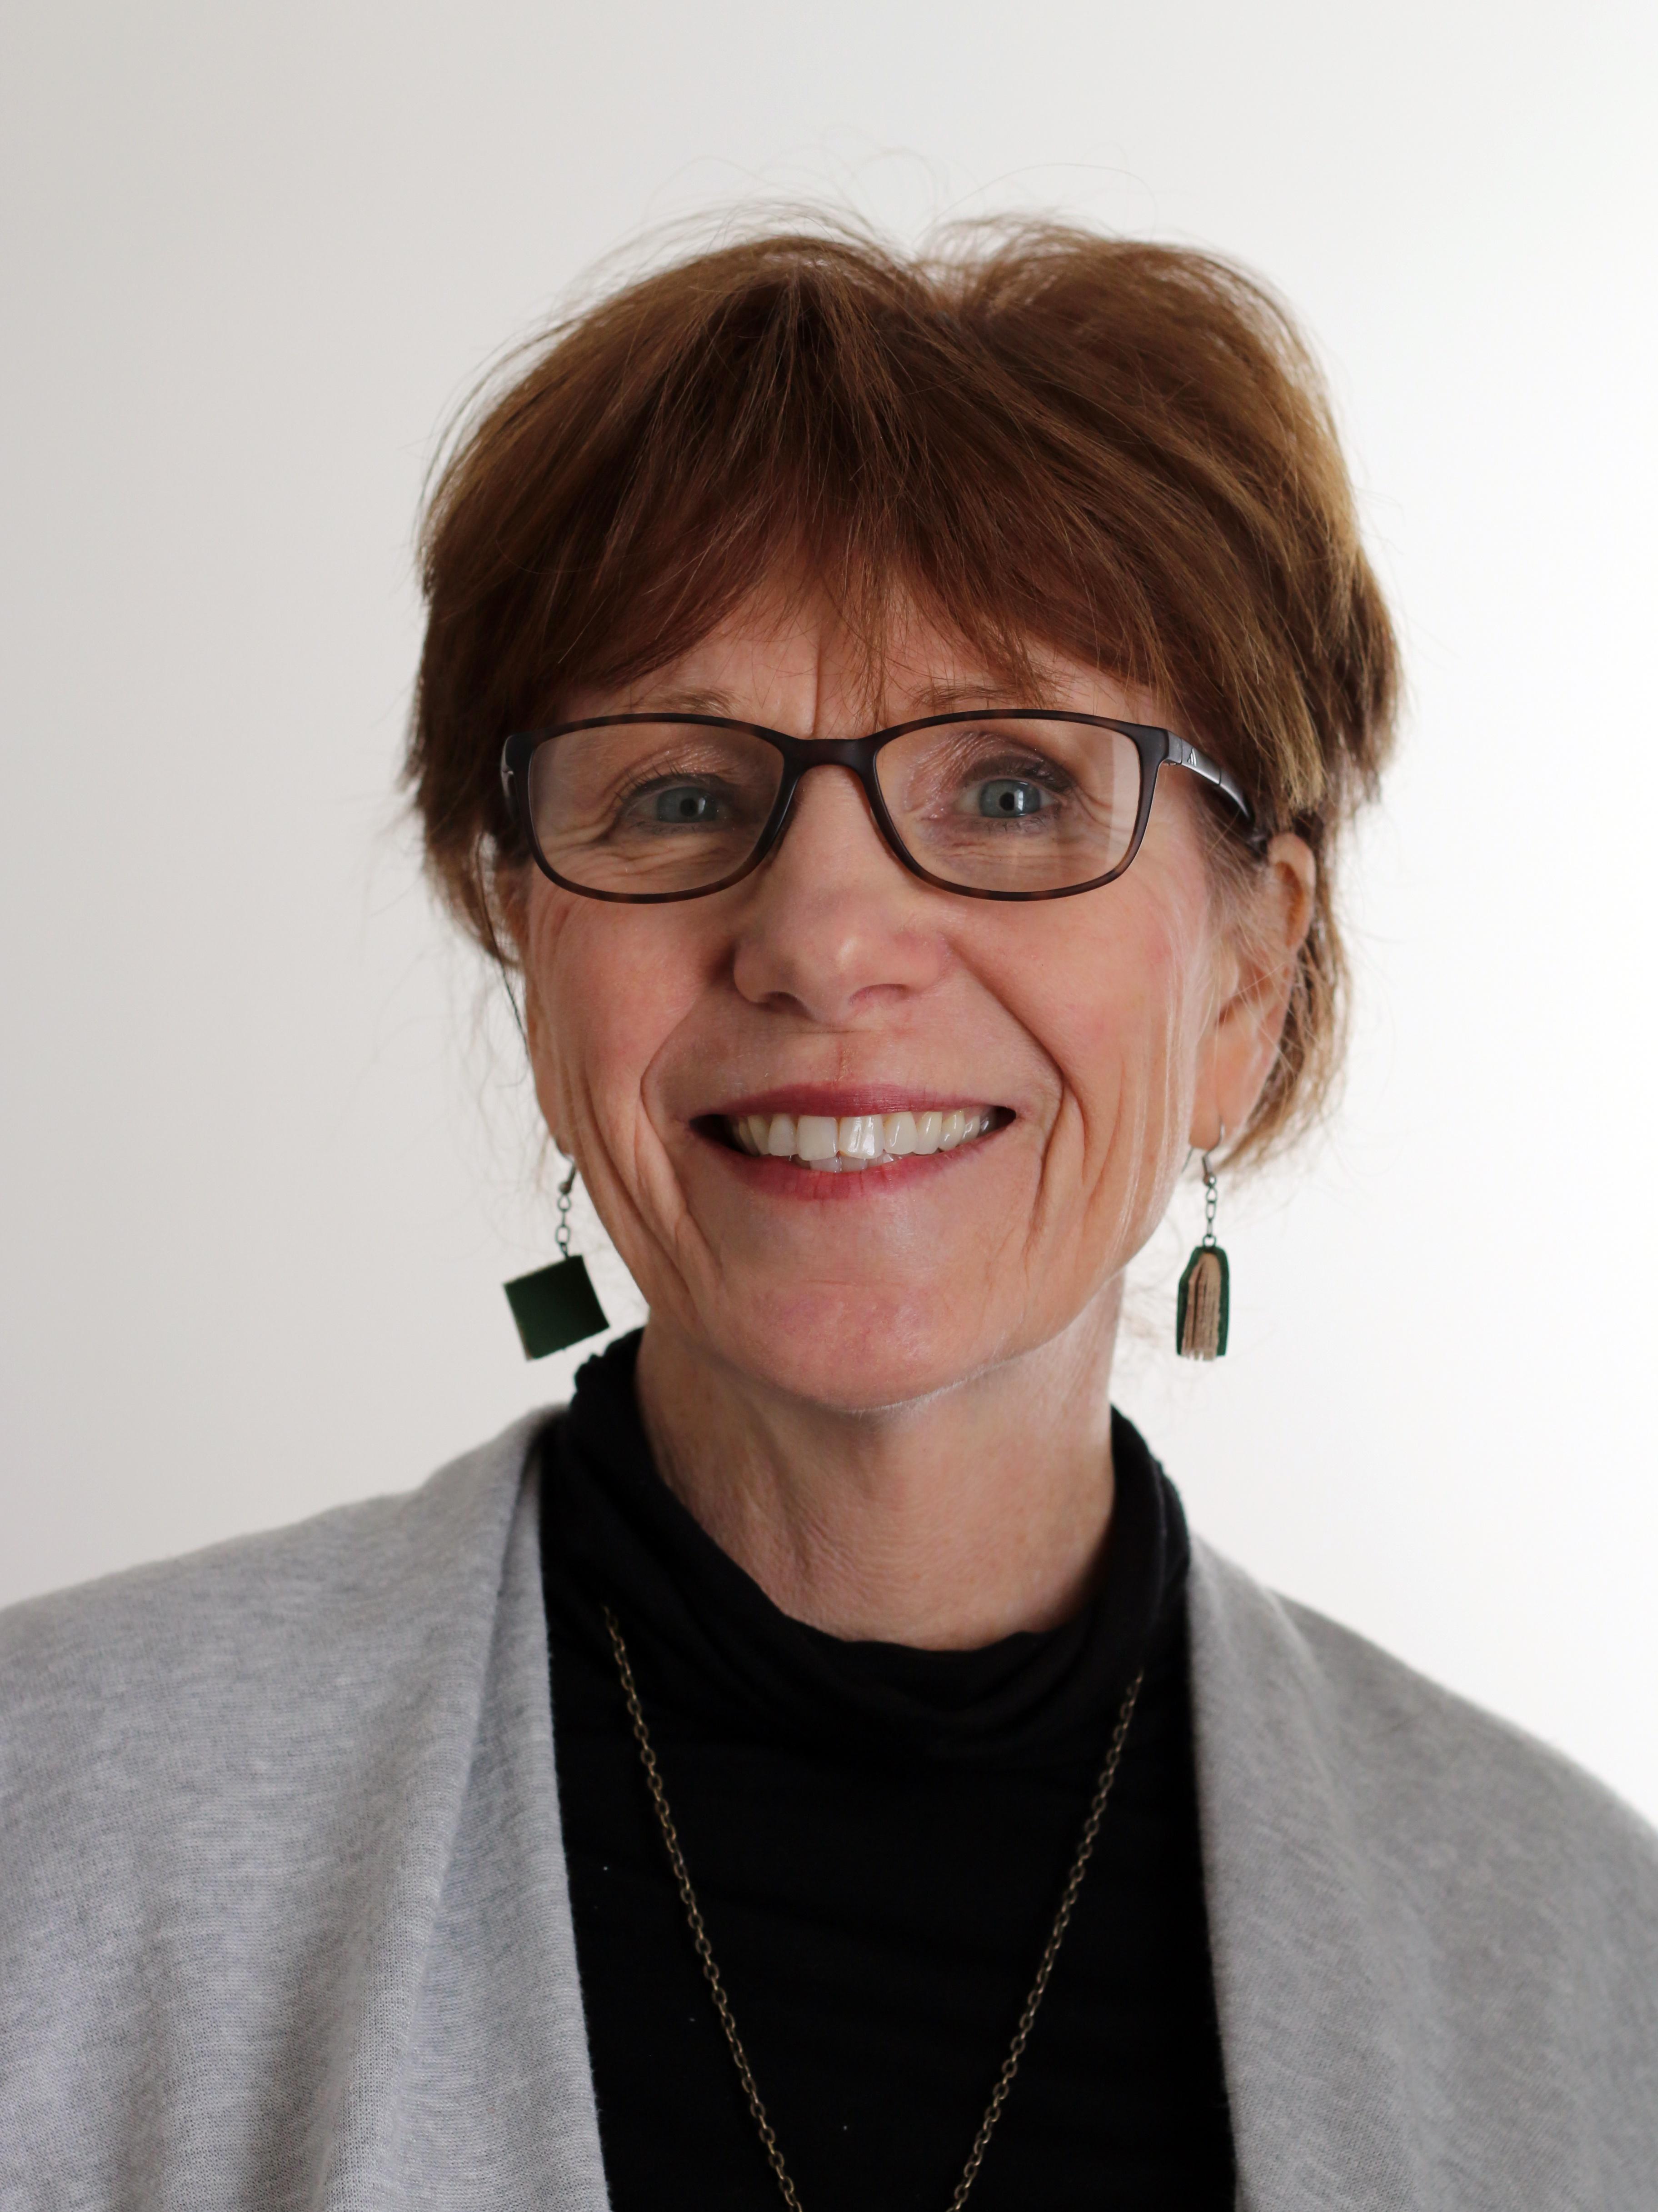 Bridget Reistad